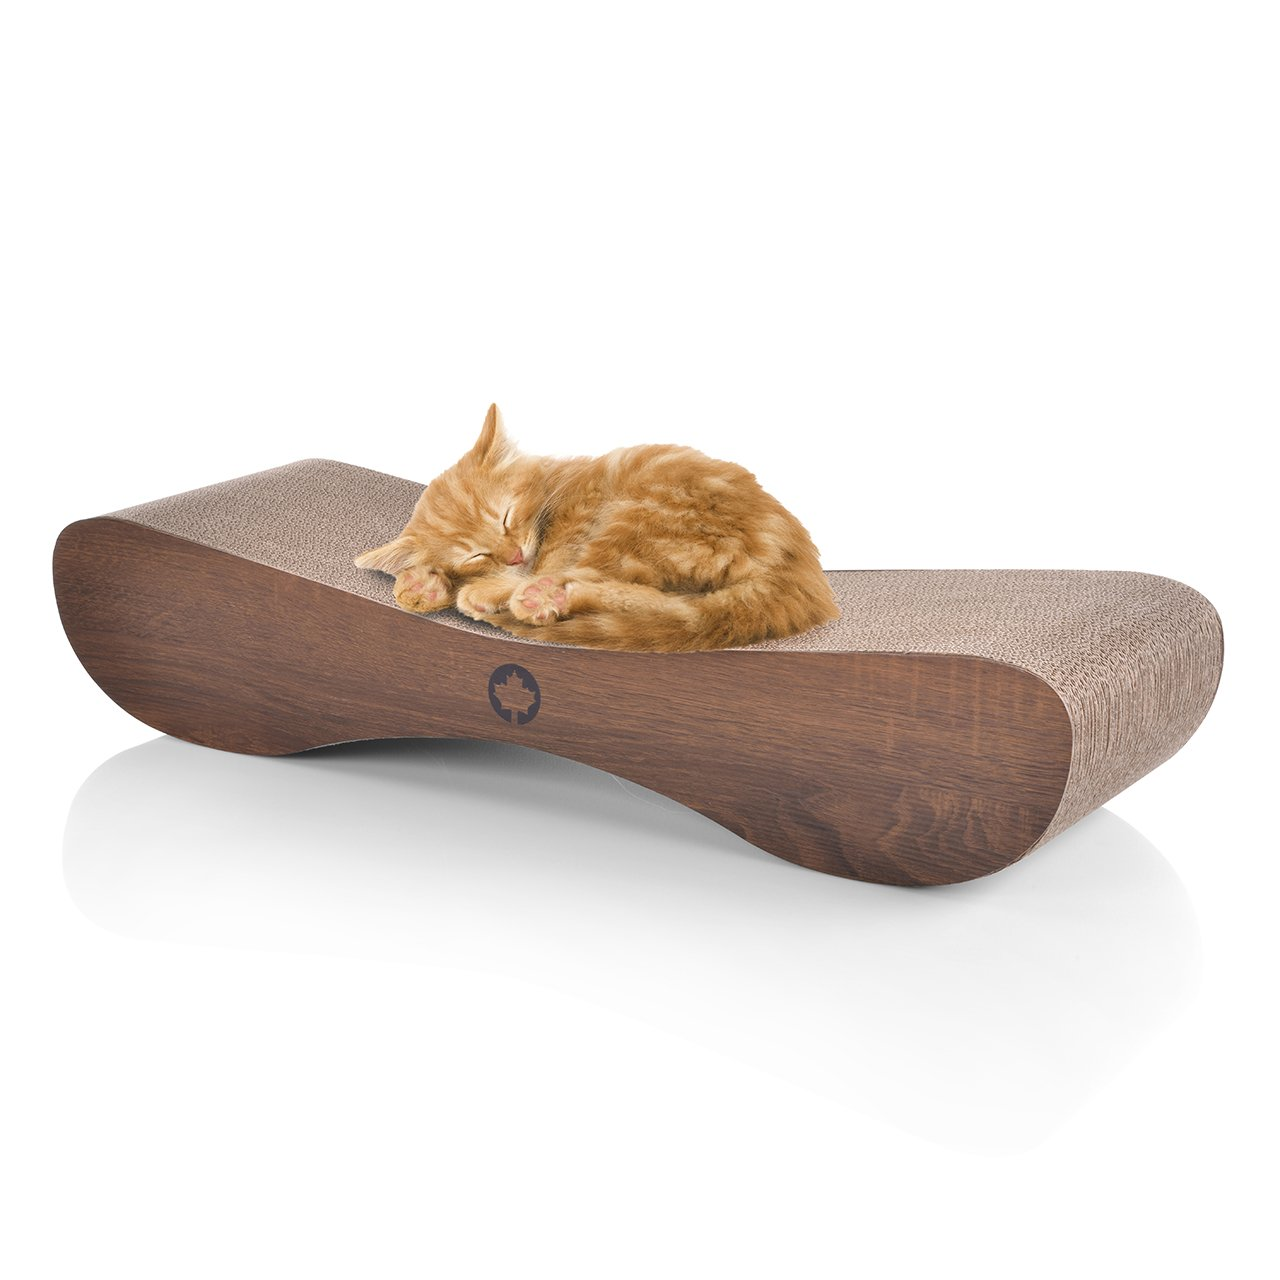 CanadianCat Company | XXL Satellite 2.0 Lounge | Walnuss | Kratzmöbel,  Kratzbrett | Qualitäts Pappe +Katzenminze | 76 X 24 X 15cm: Amazon.de:  Haustier